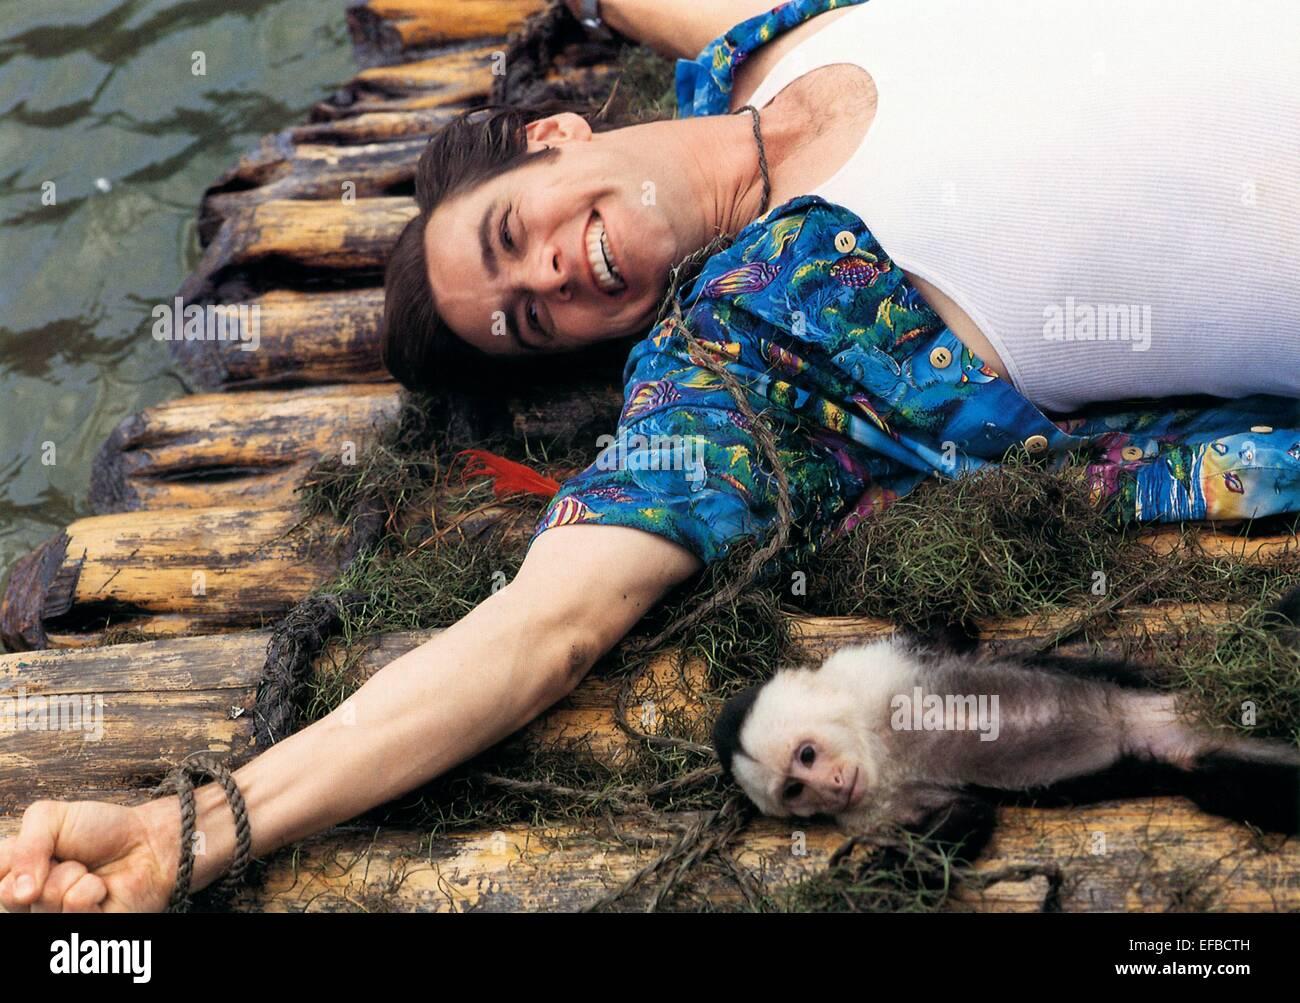 Ace Ventura: When Nature Calls - FandangoNOW